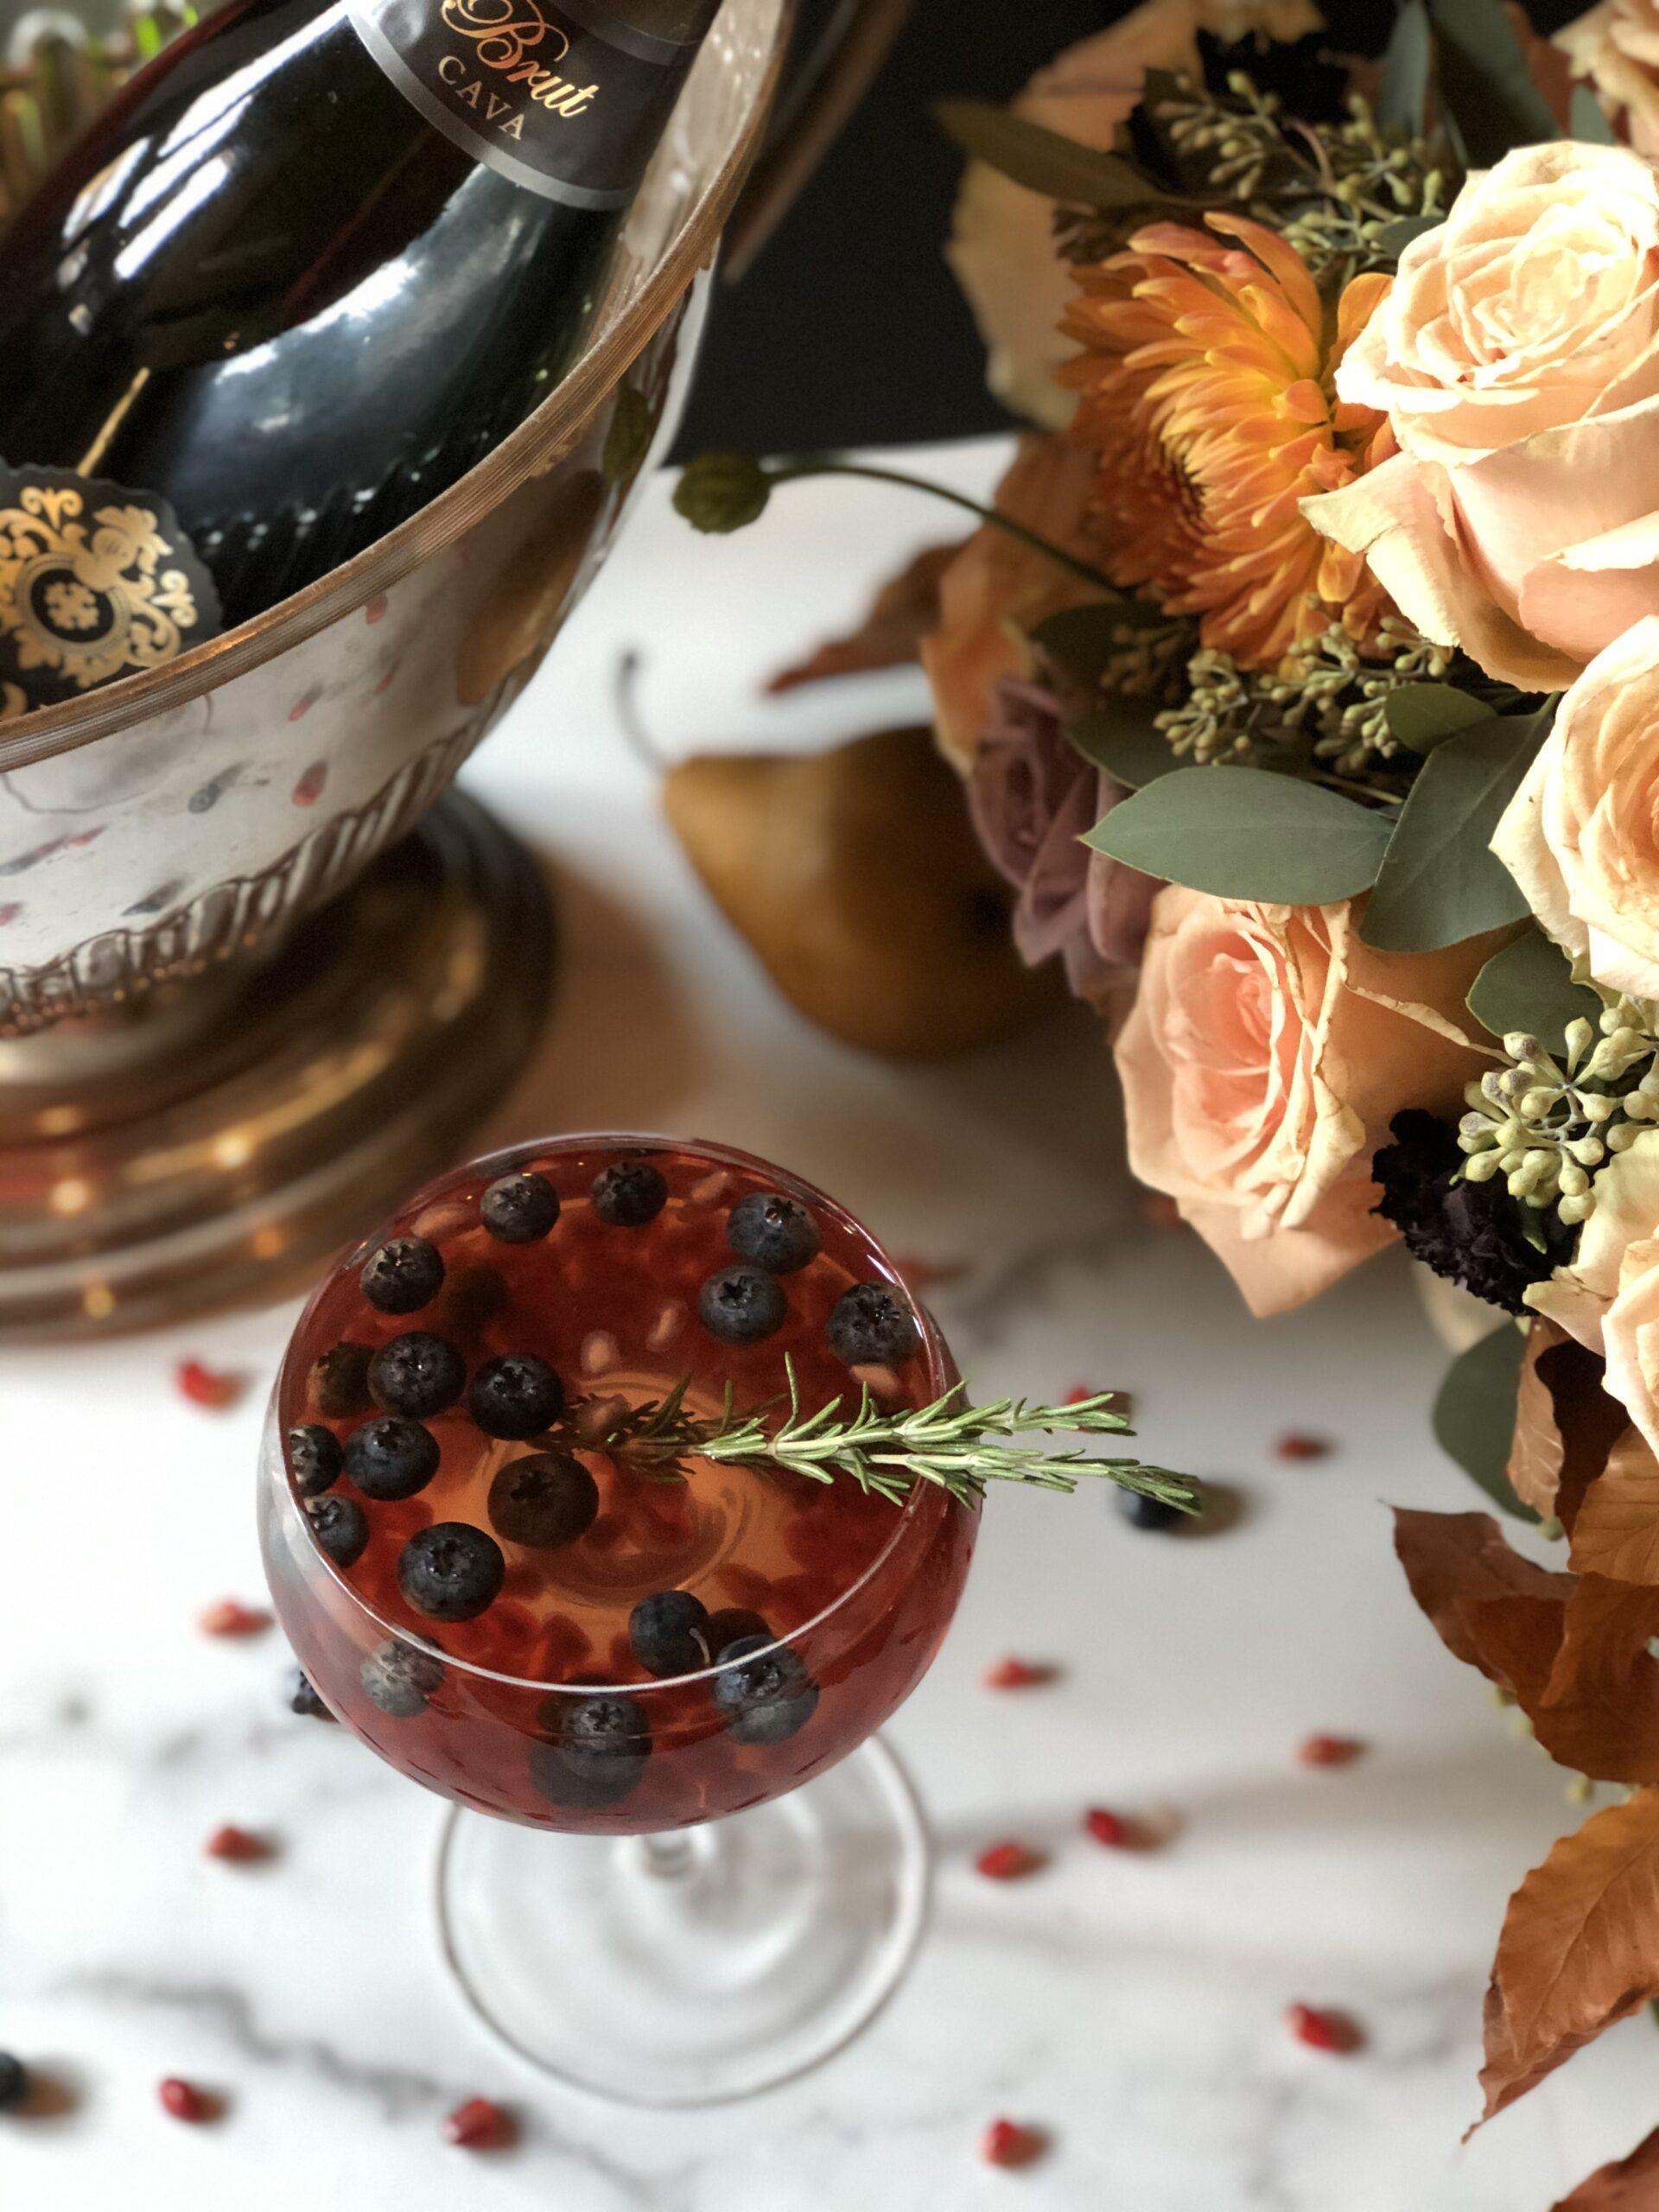 Sparkling Pomogranate Rosemary Spritzer Cocktail